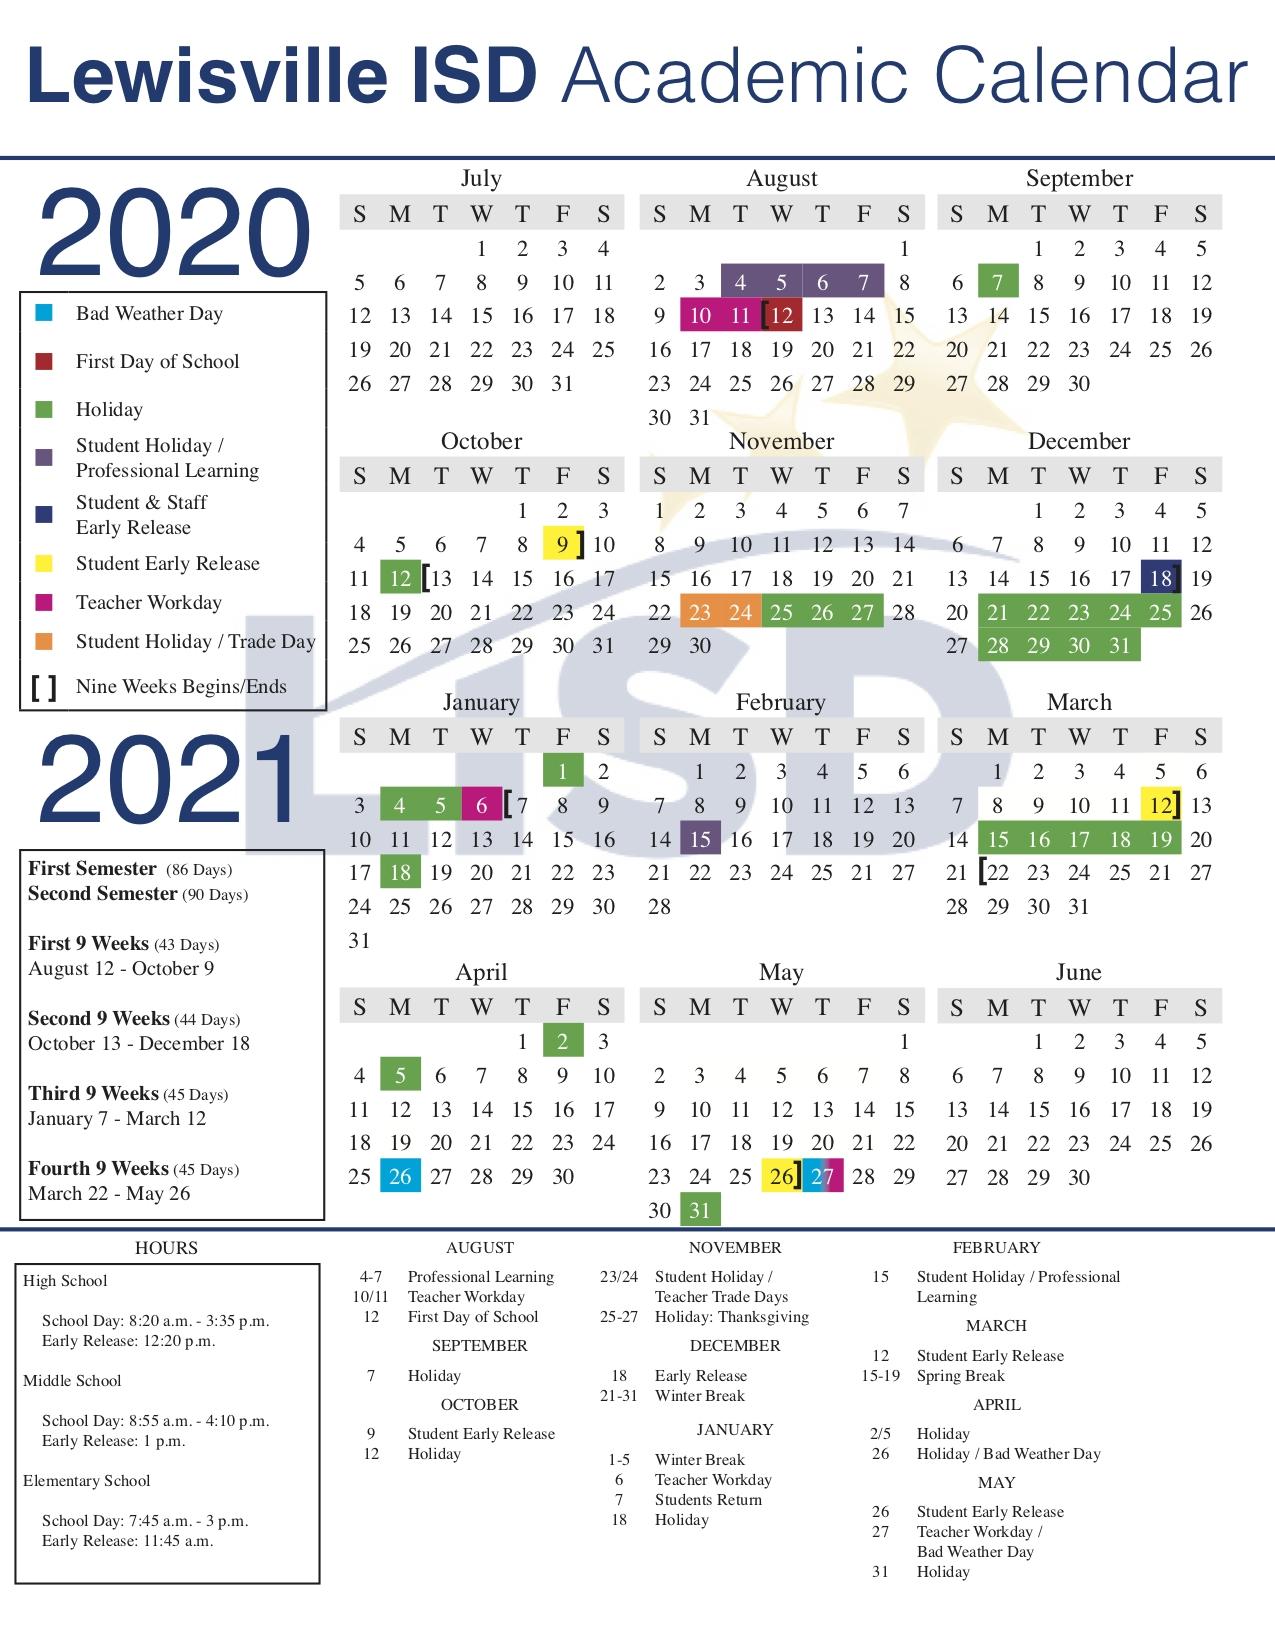 Leap Year Julian Calendar | Printable Calendar 2020-2021